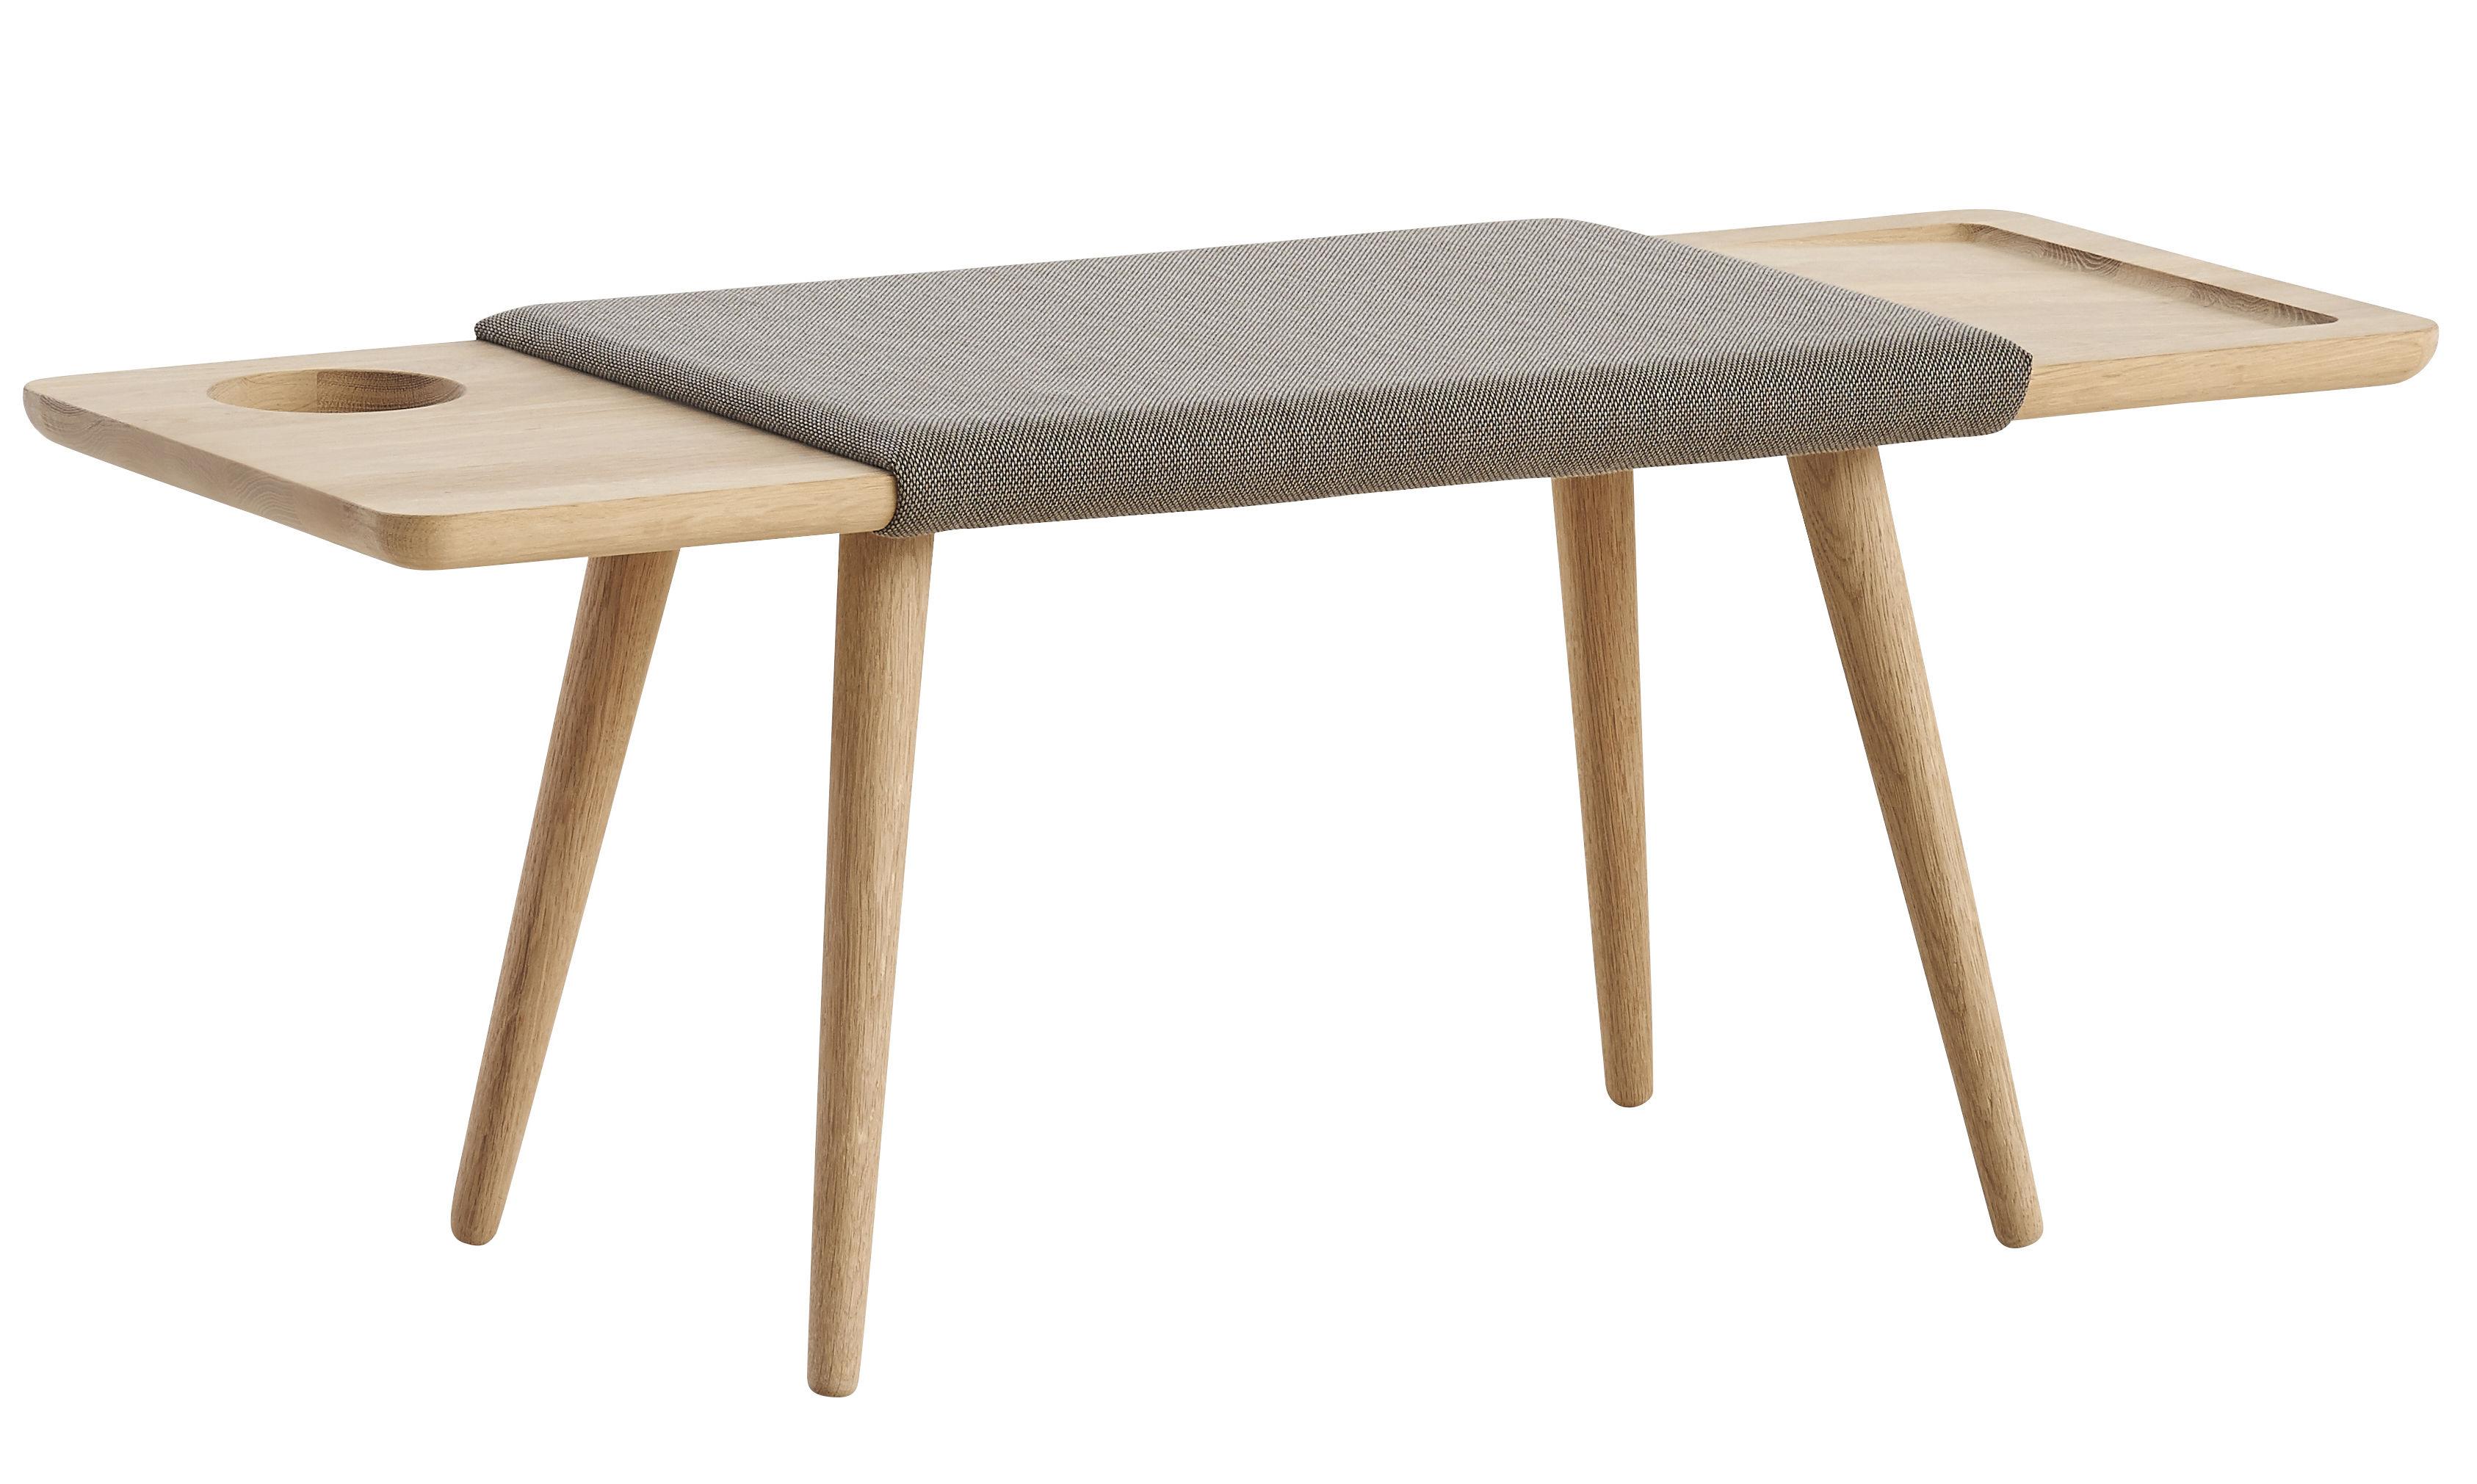 Mobilier - Bancs - Banc Baenk / L 110 cm - Chêne & tissu - Woud - Chêne / Tissu beige - Chêne massif savonné, Mousse, Tissu Gabriel